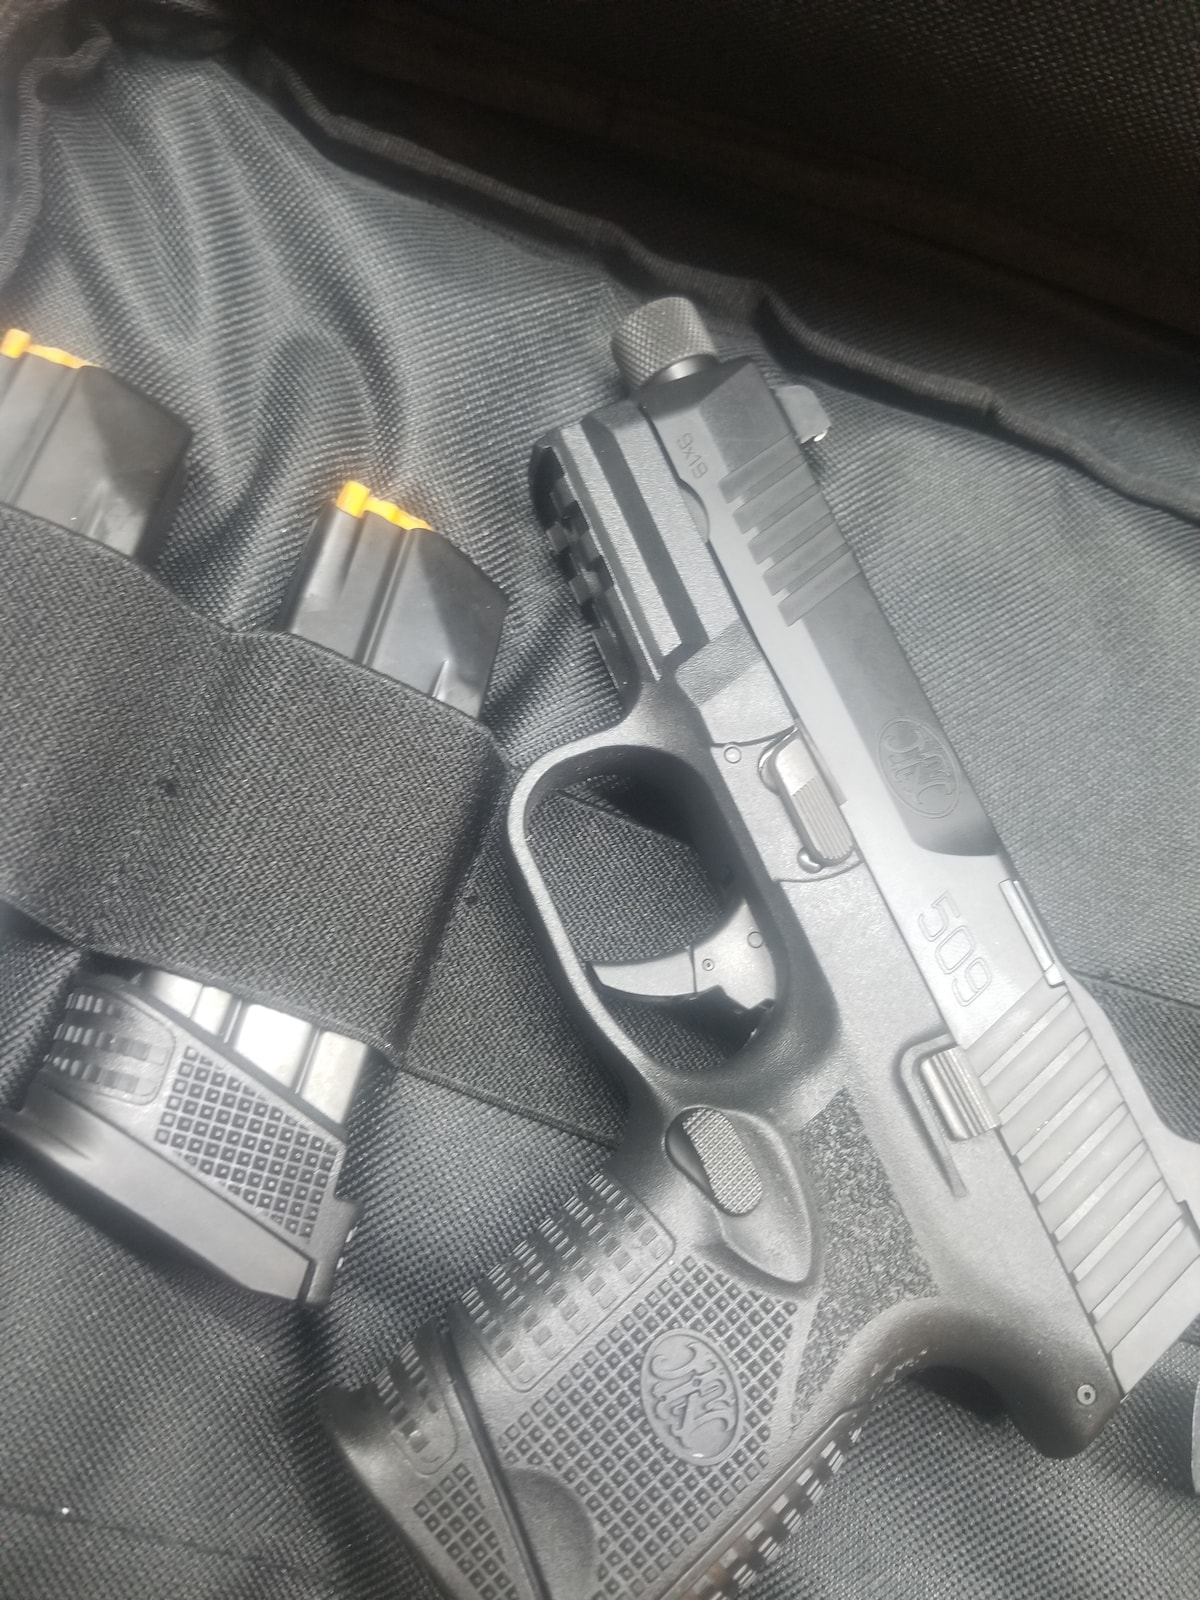 FN AMERICAN 509C TACTICAL